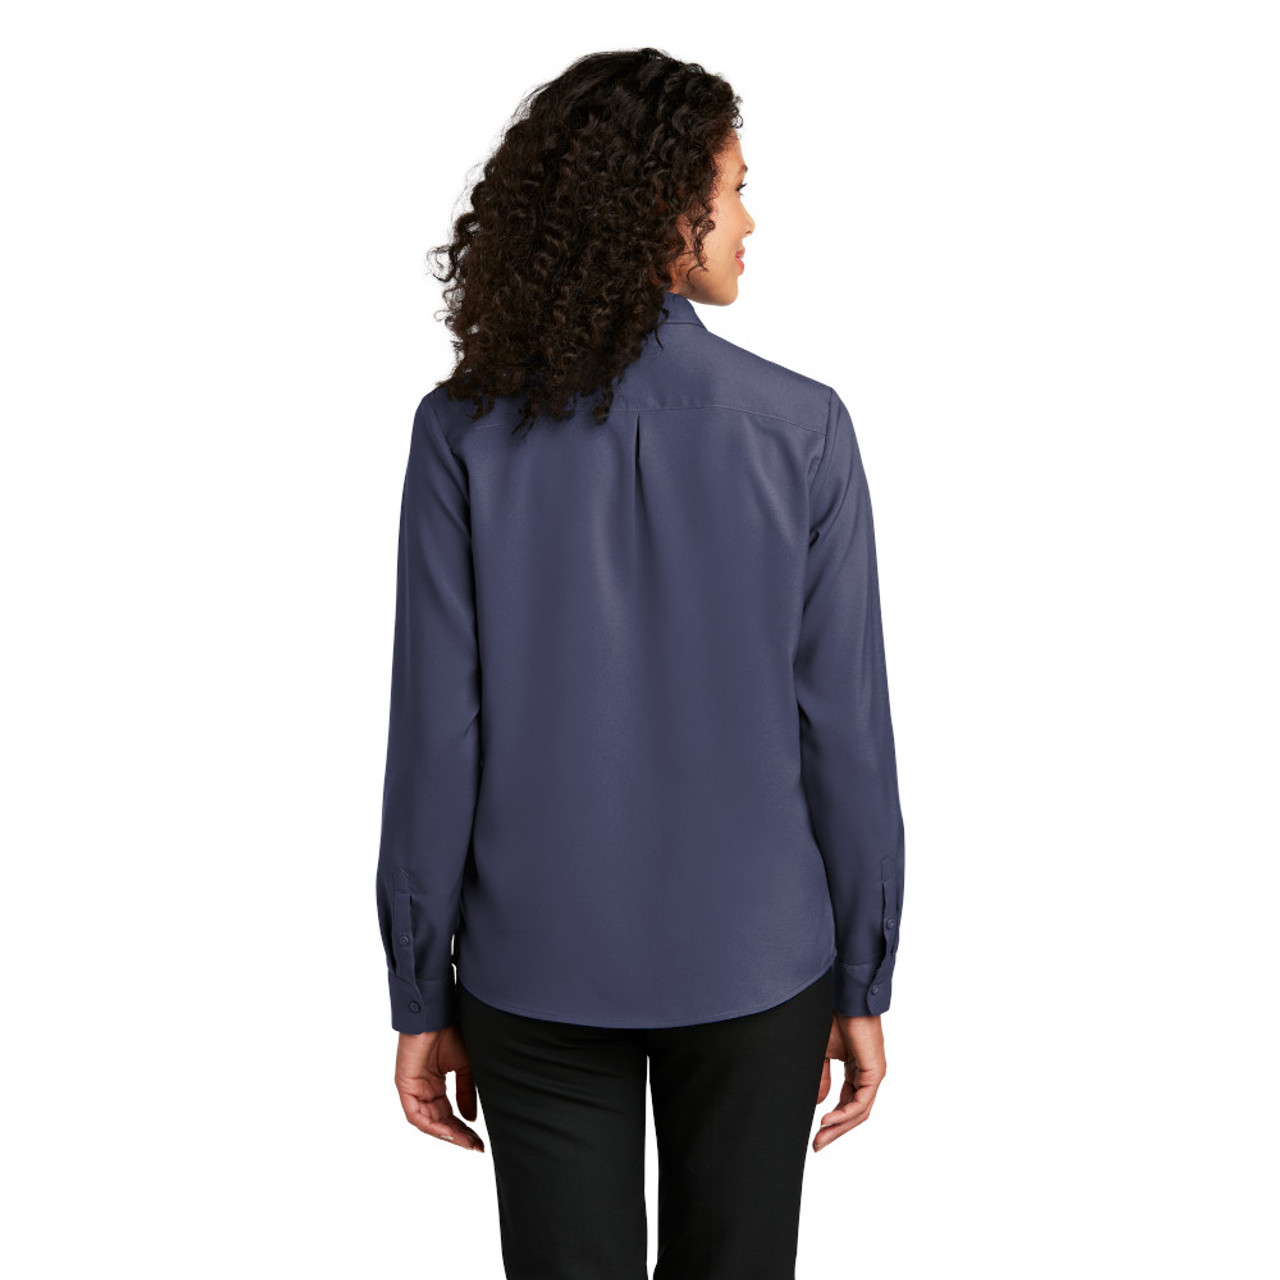 Ladies Long Sleeve Performance Staff Shirt